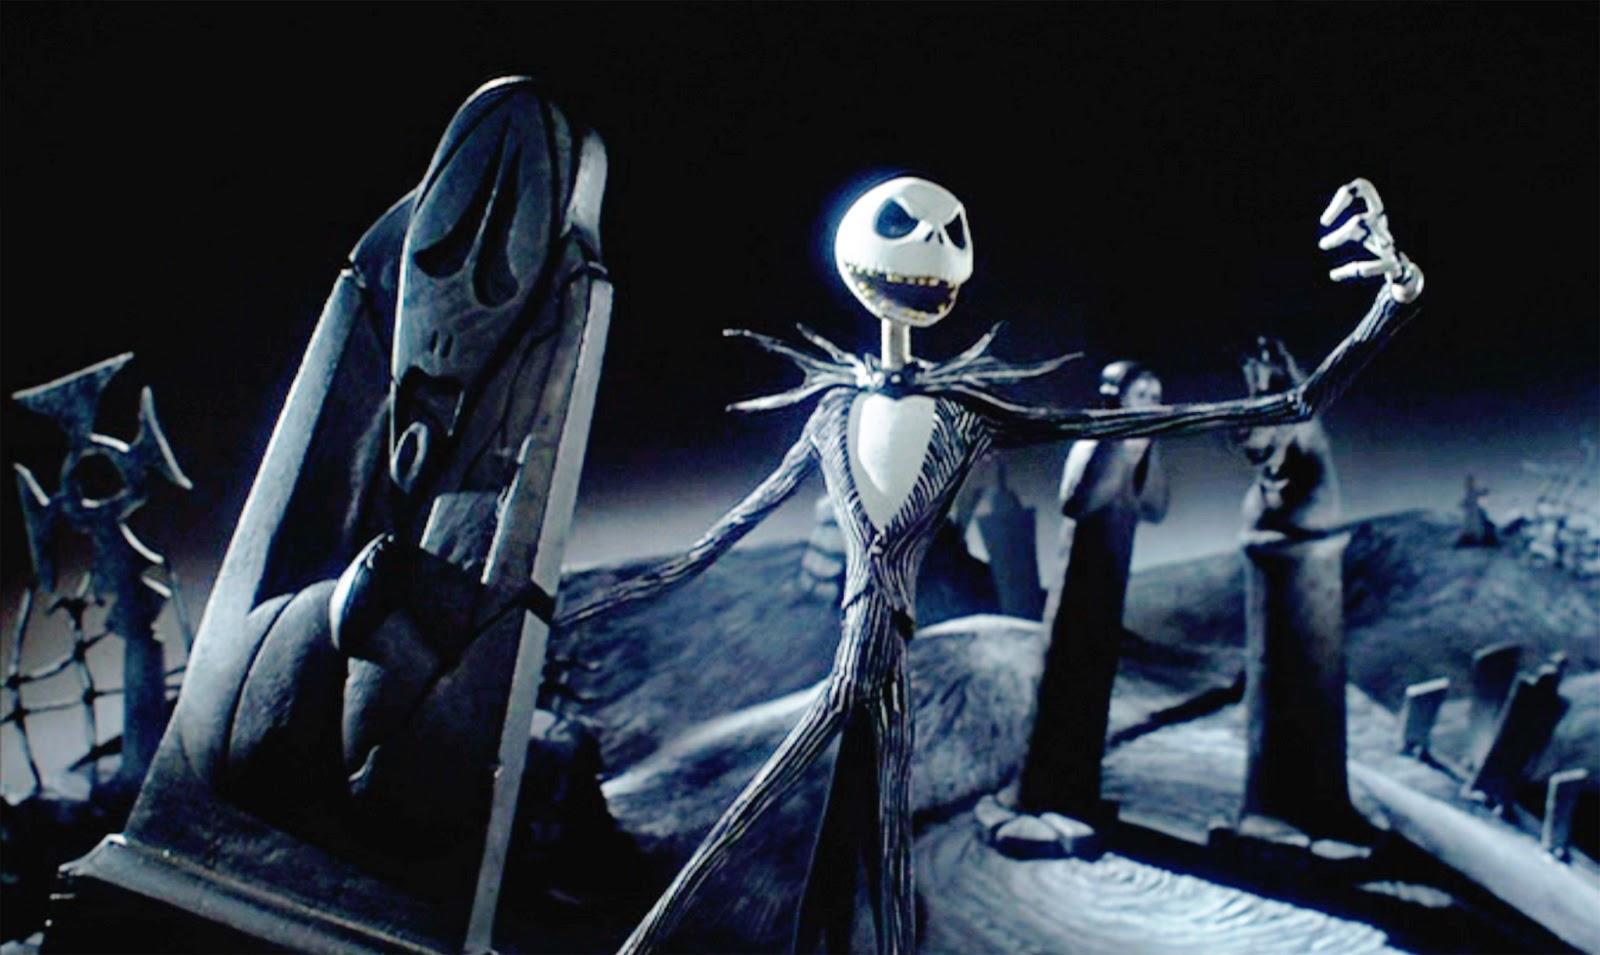 Jack And Sally Nightmare Before Christmas Screensaver